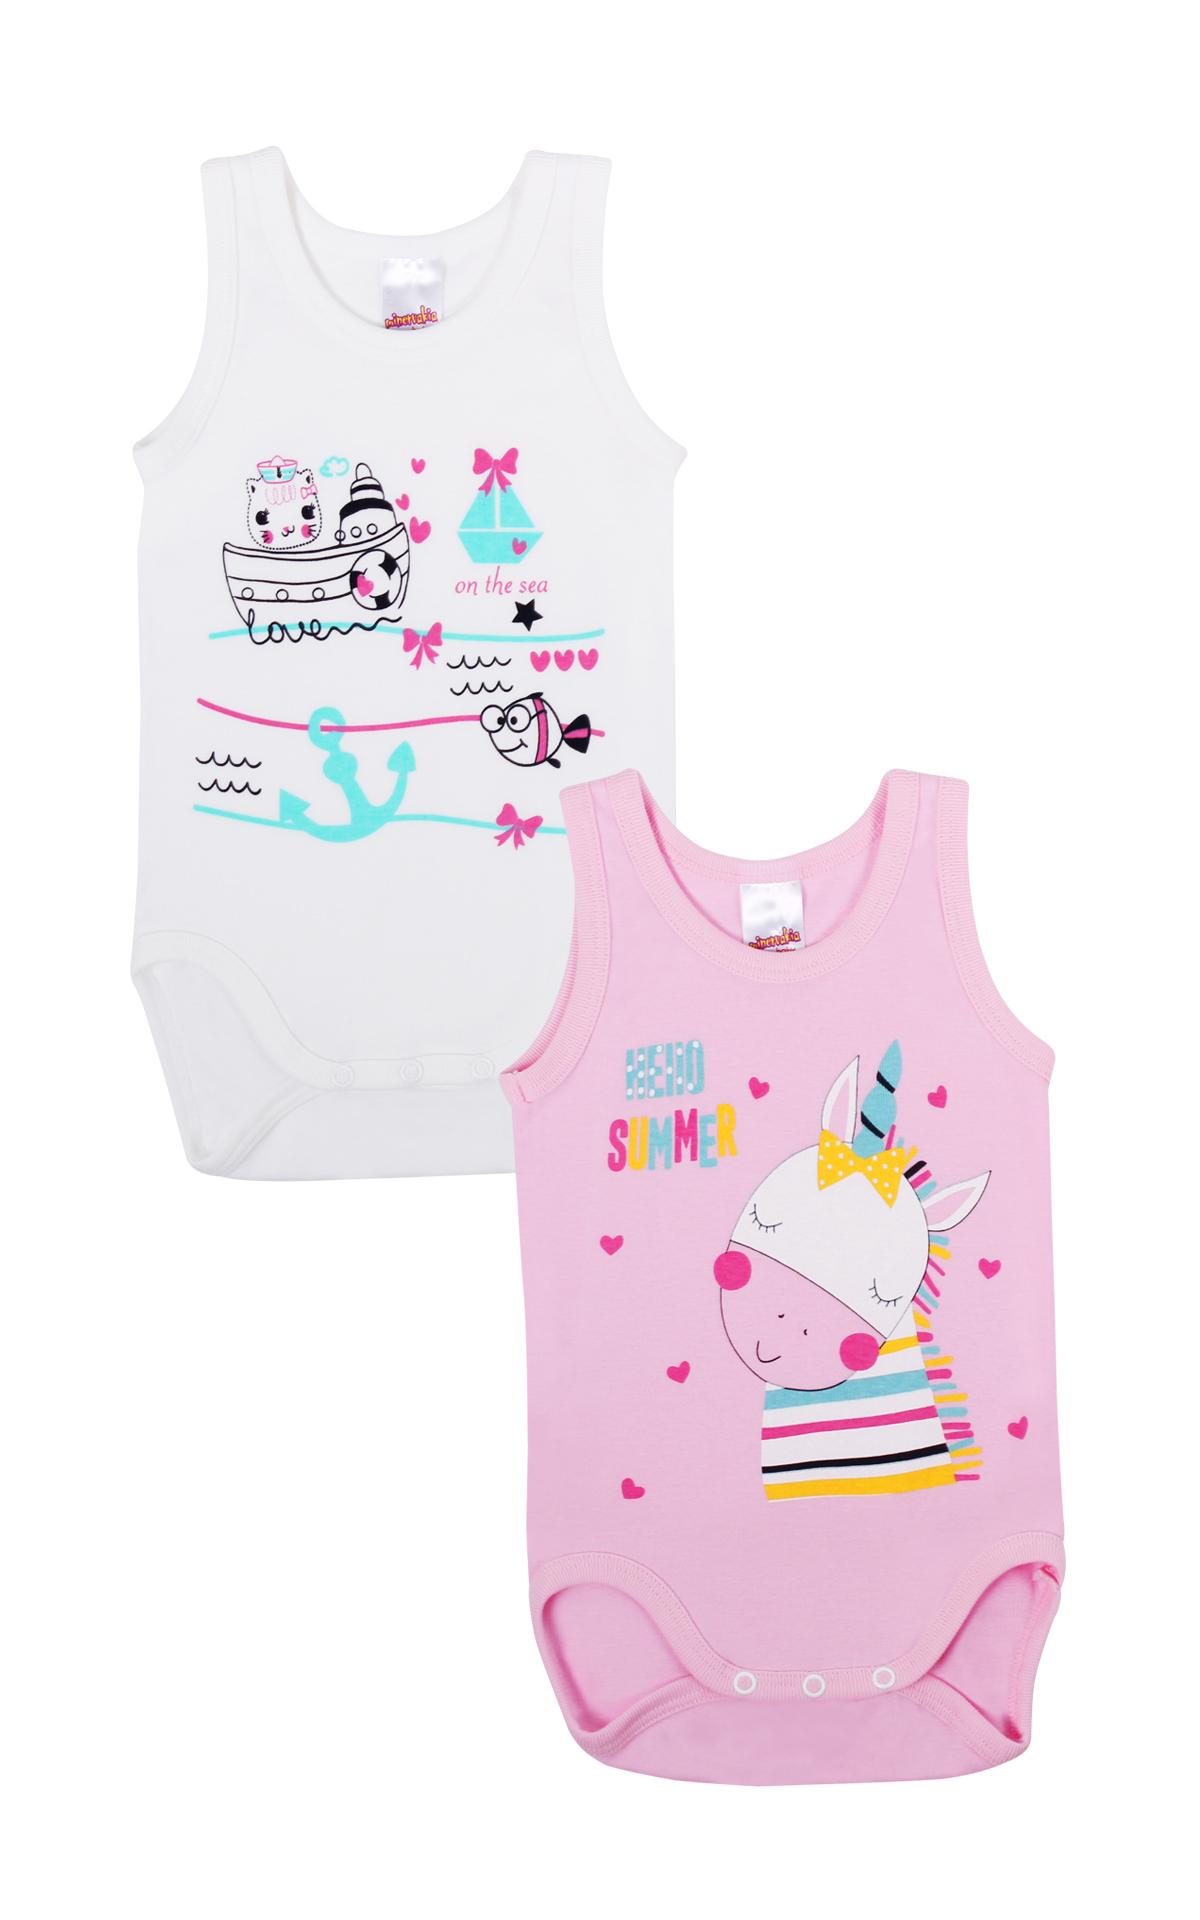 139c28672a8477 Kid-Teen Baby Girl Underwear Unicorn 2 pcs Baby's Underwear Body